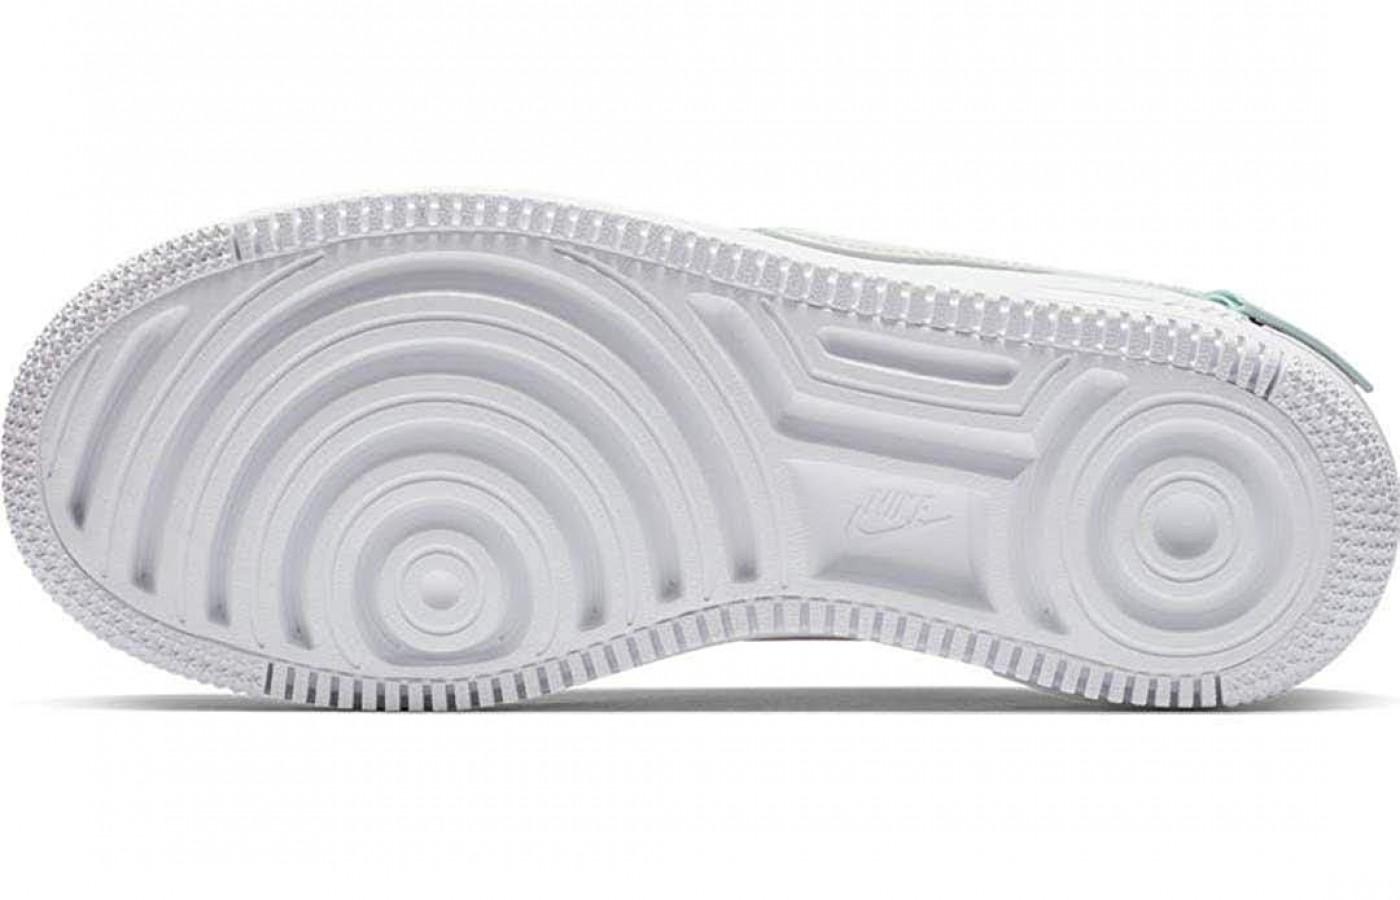 Nike Air Force 1 Jester XX bottom